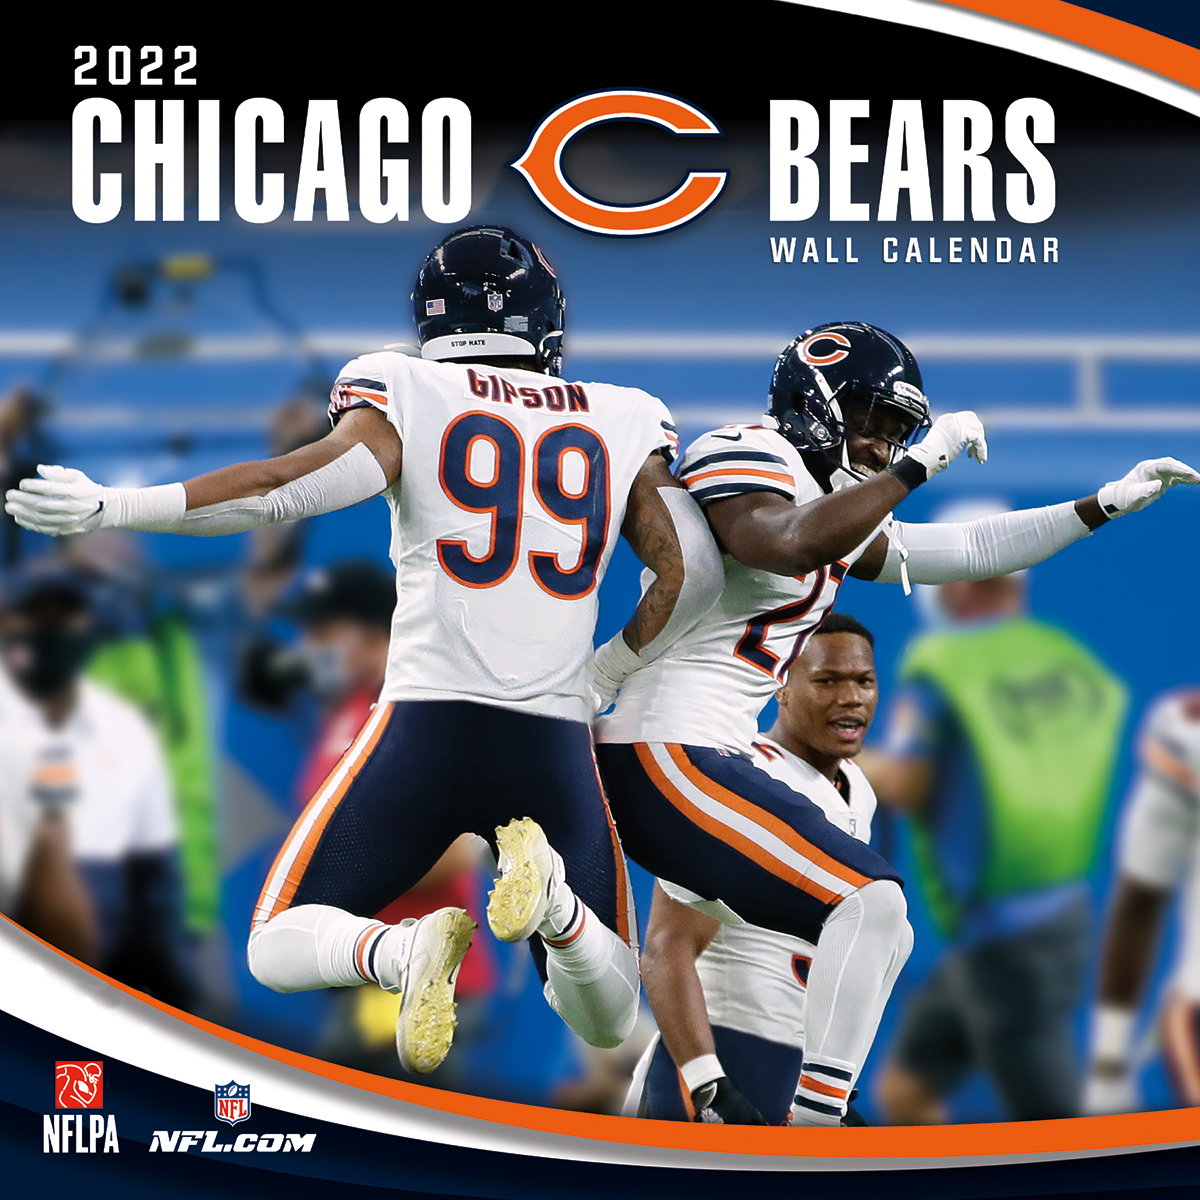 Philadelphia Eagles Team 2017 >> Chicago Bears 2018 NFL Wall Calendar - Buy at KHC Sports